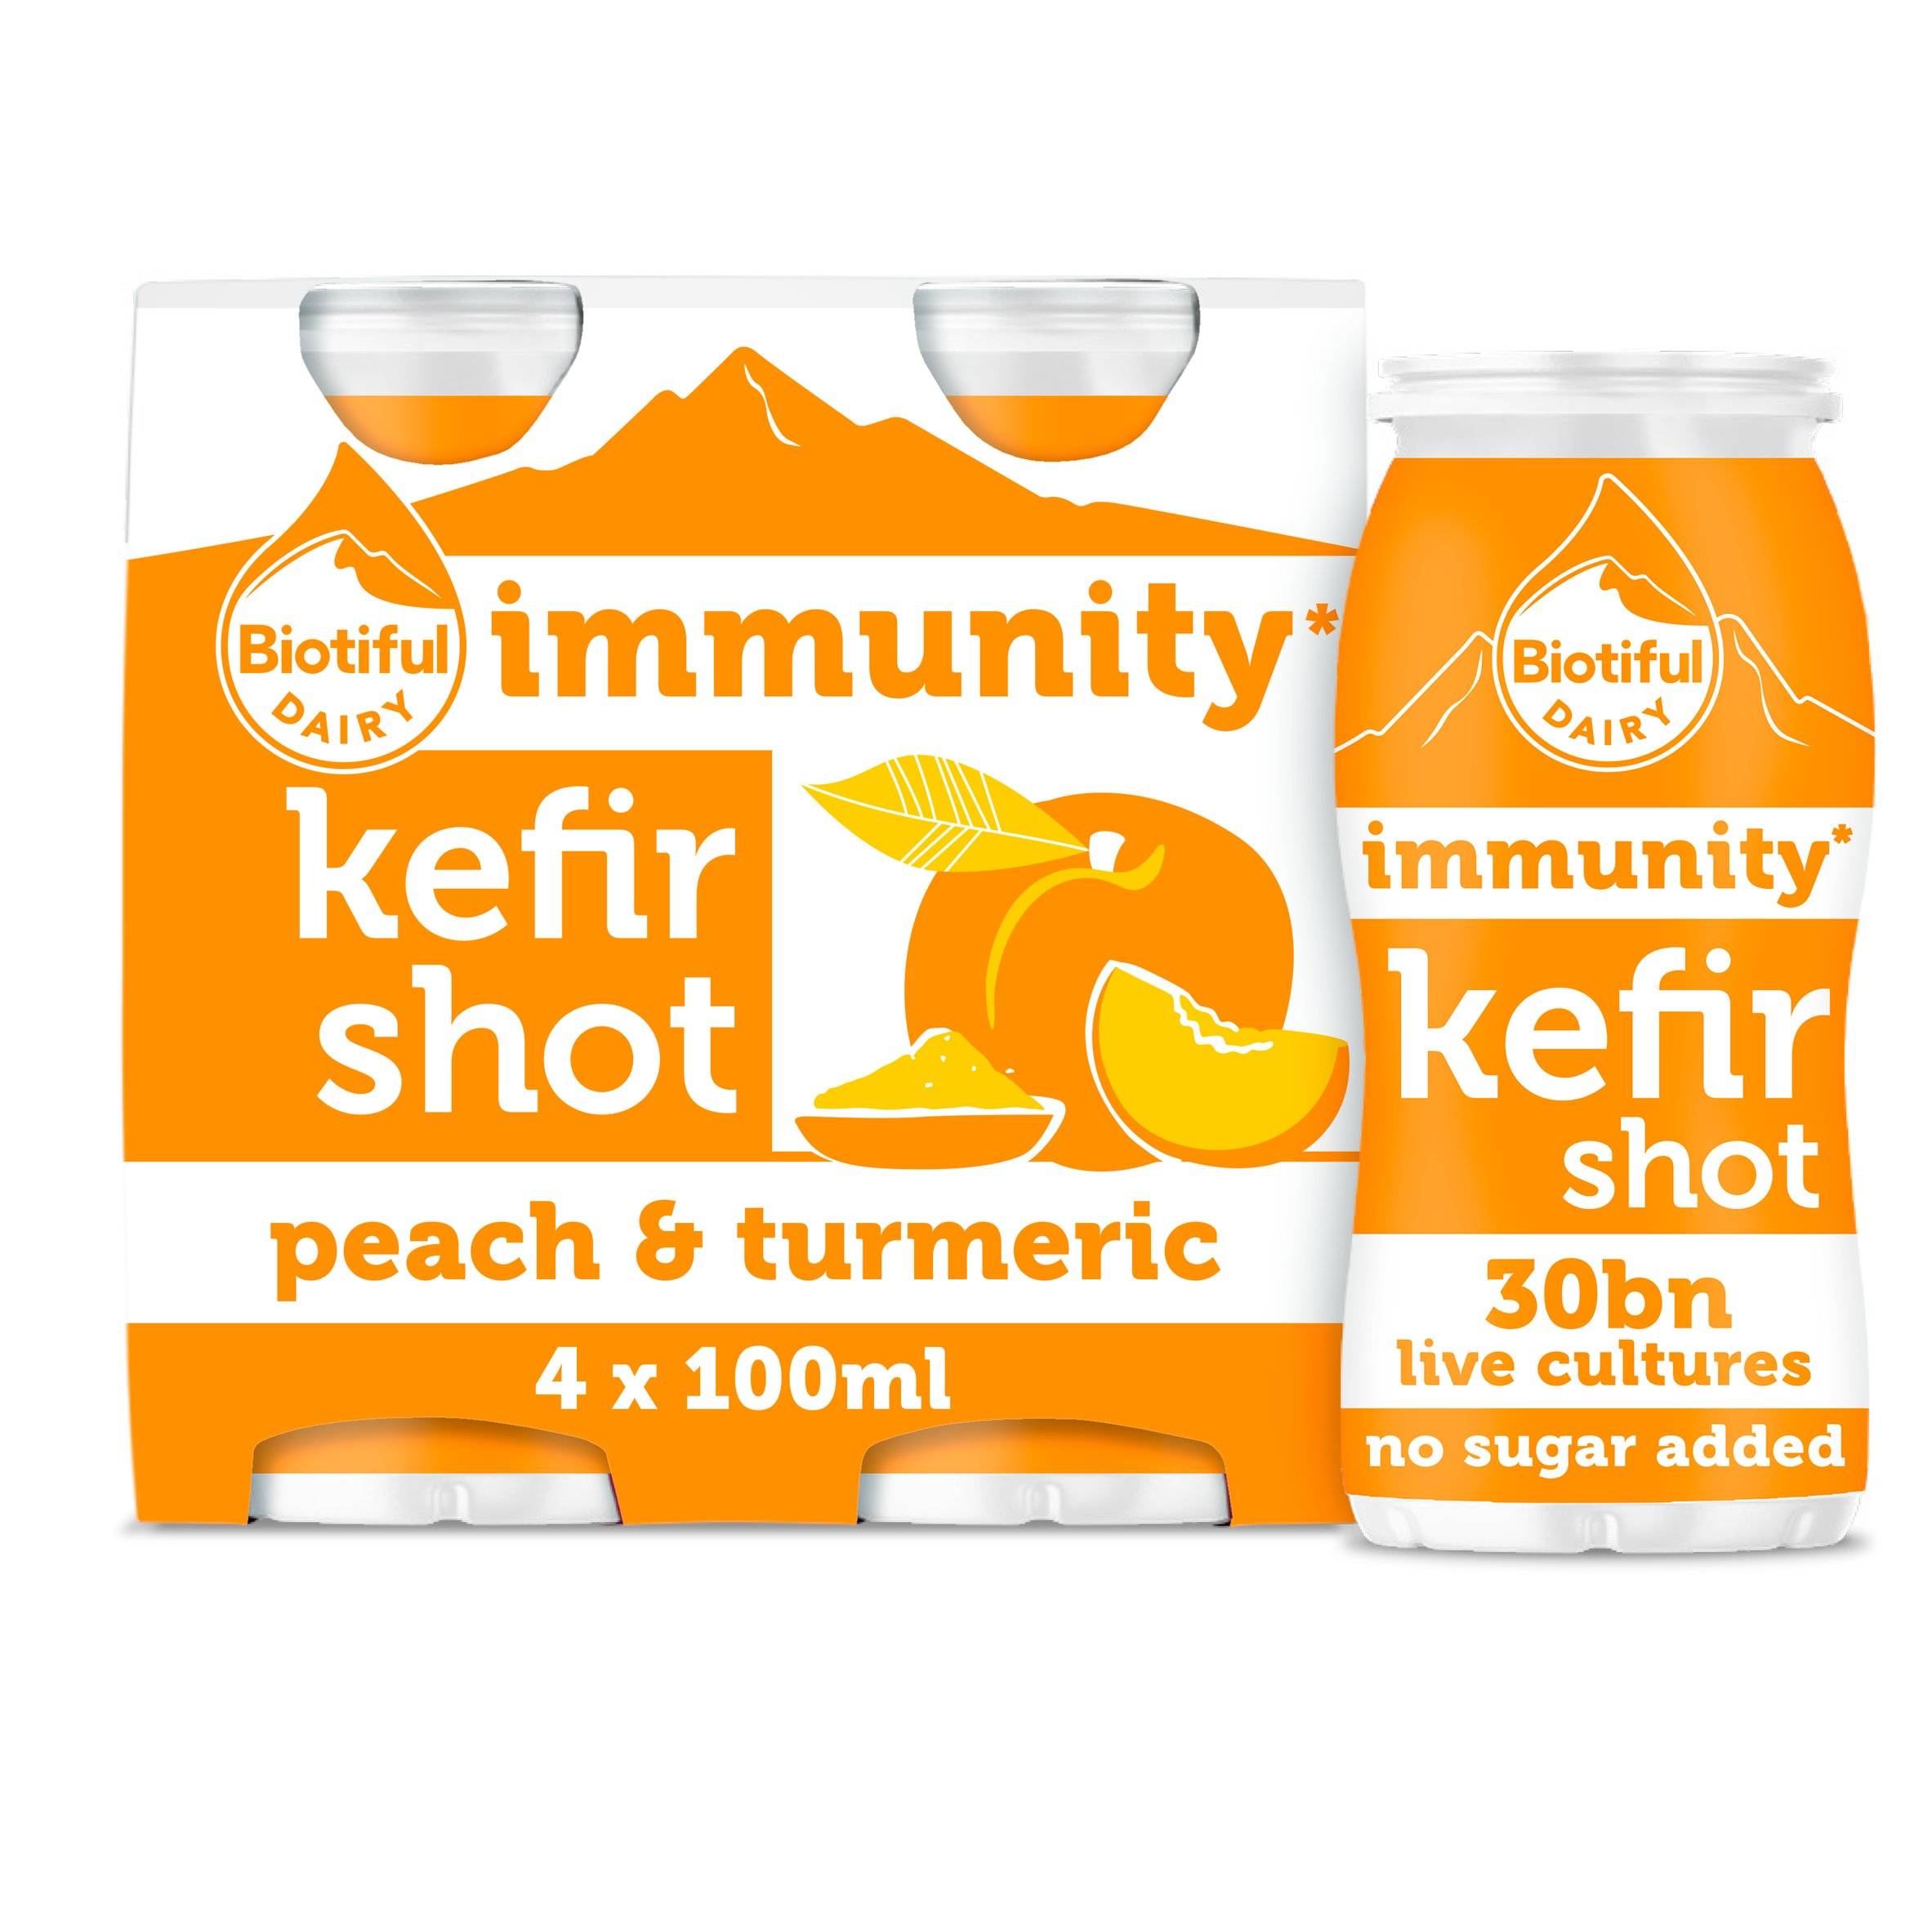 Biotiful Dairy Kefir Shot Peach & Turmeric 4X100ml